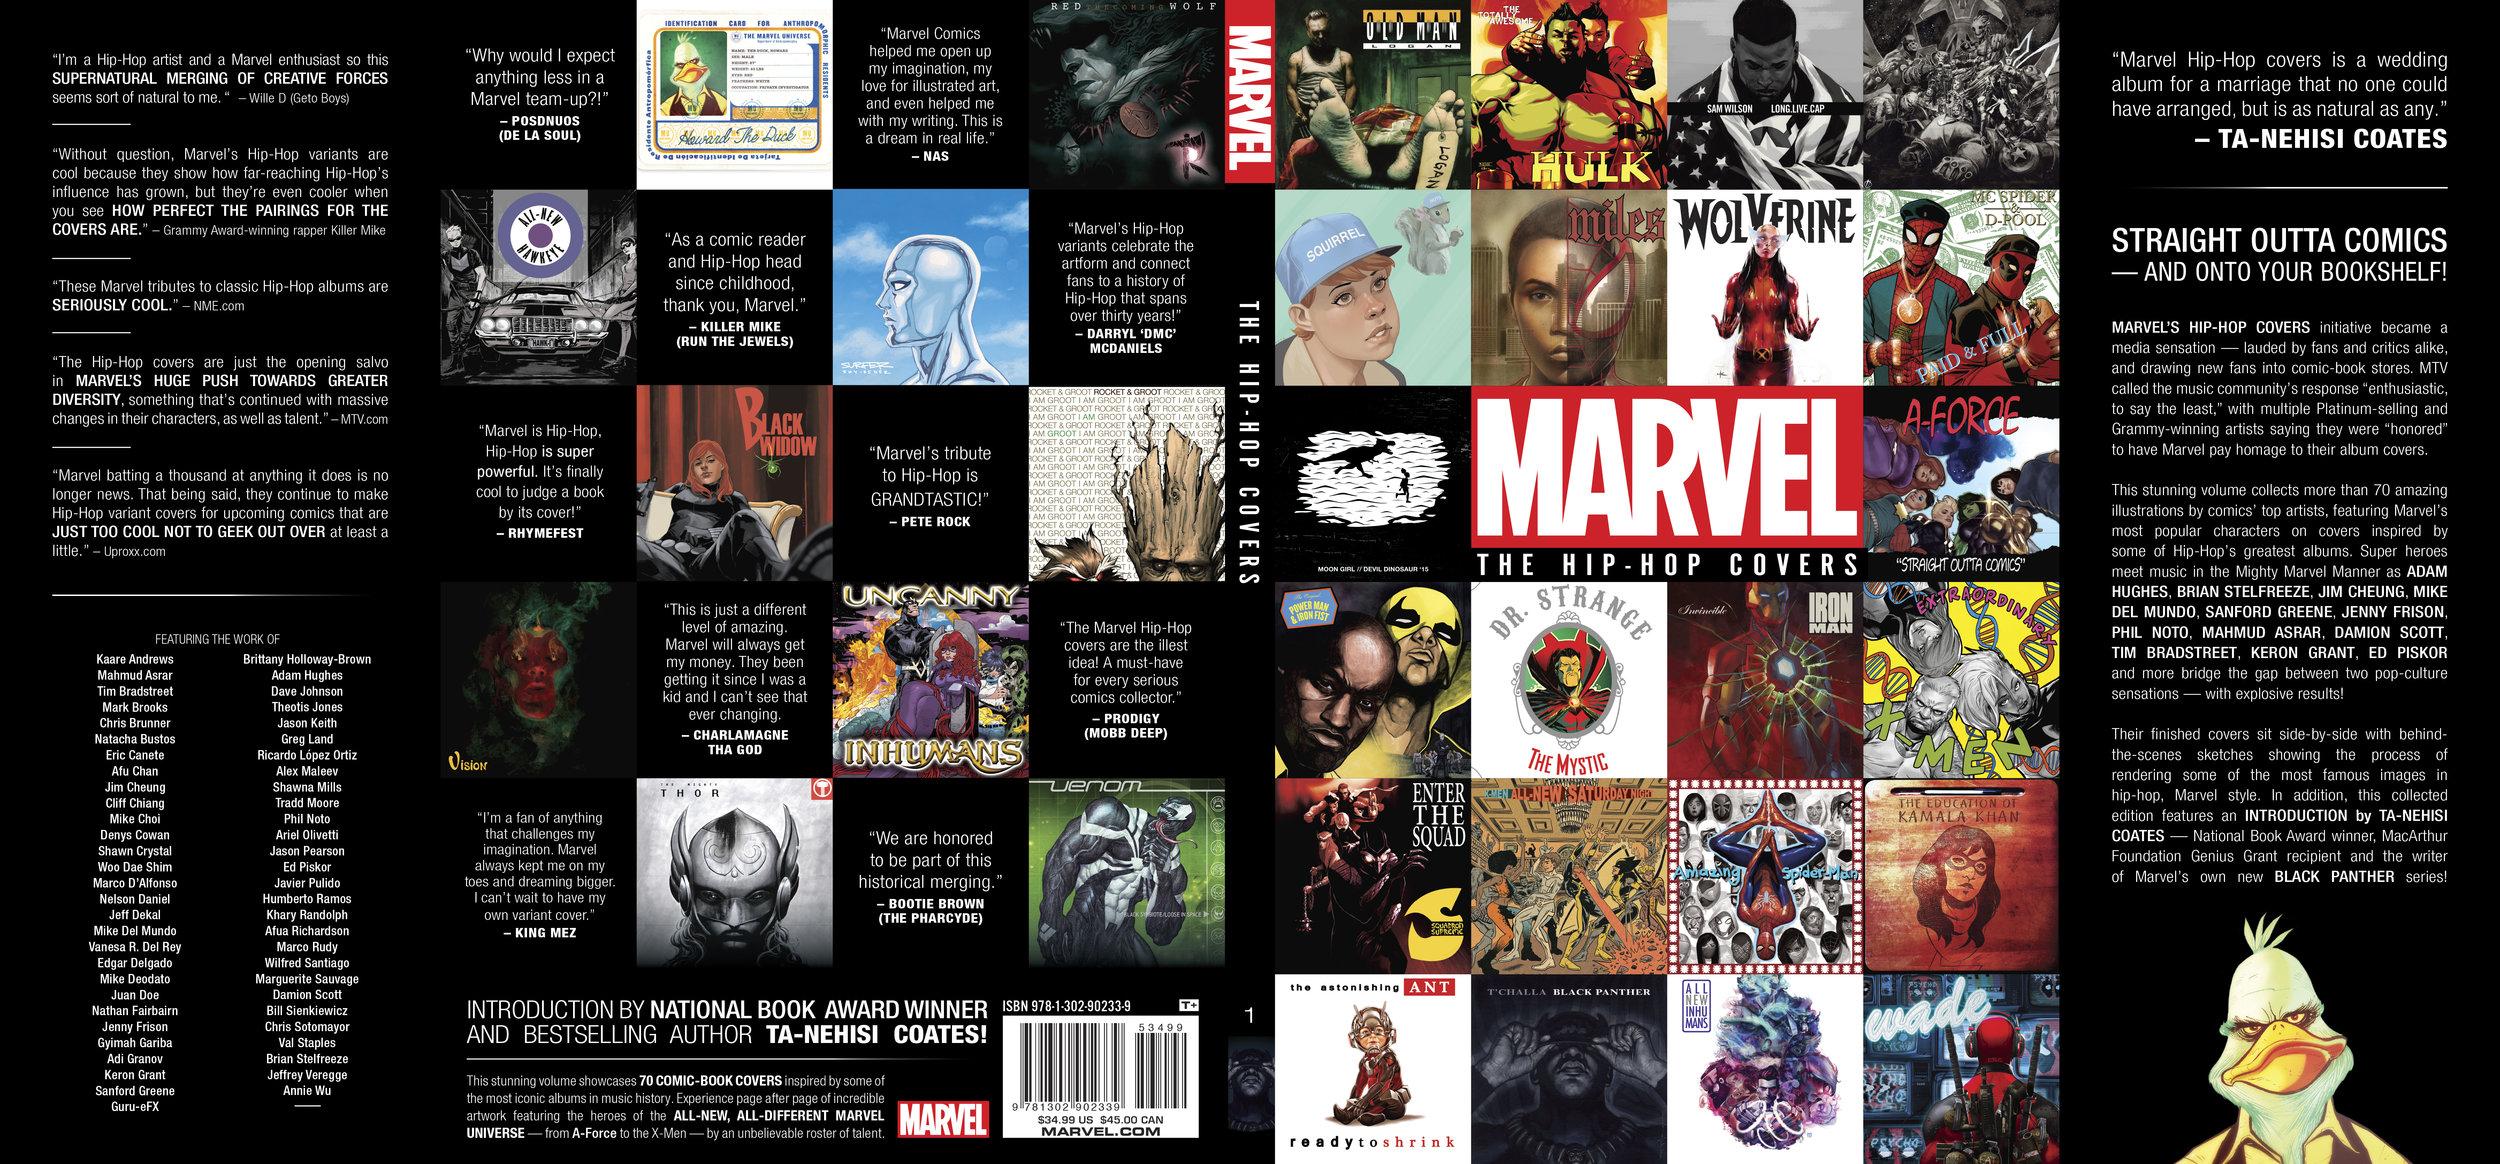 Dust jacket design for  Mavel: The Hip-Hop Covers Vol. 1 . Content copyright Marvel Entertainment, 2016.